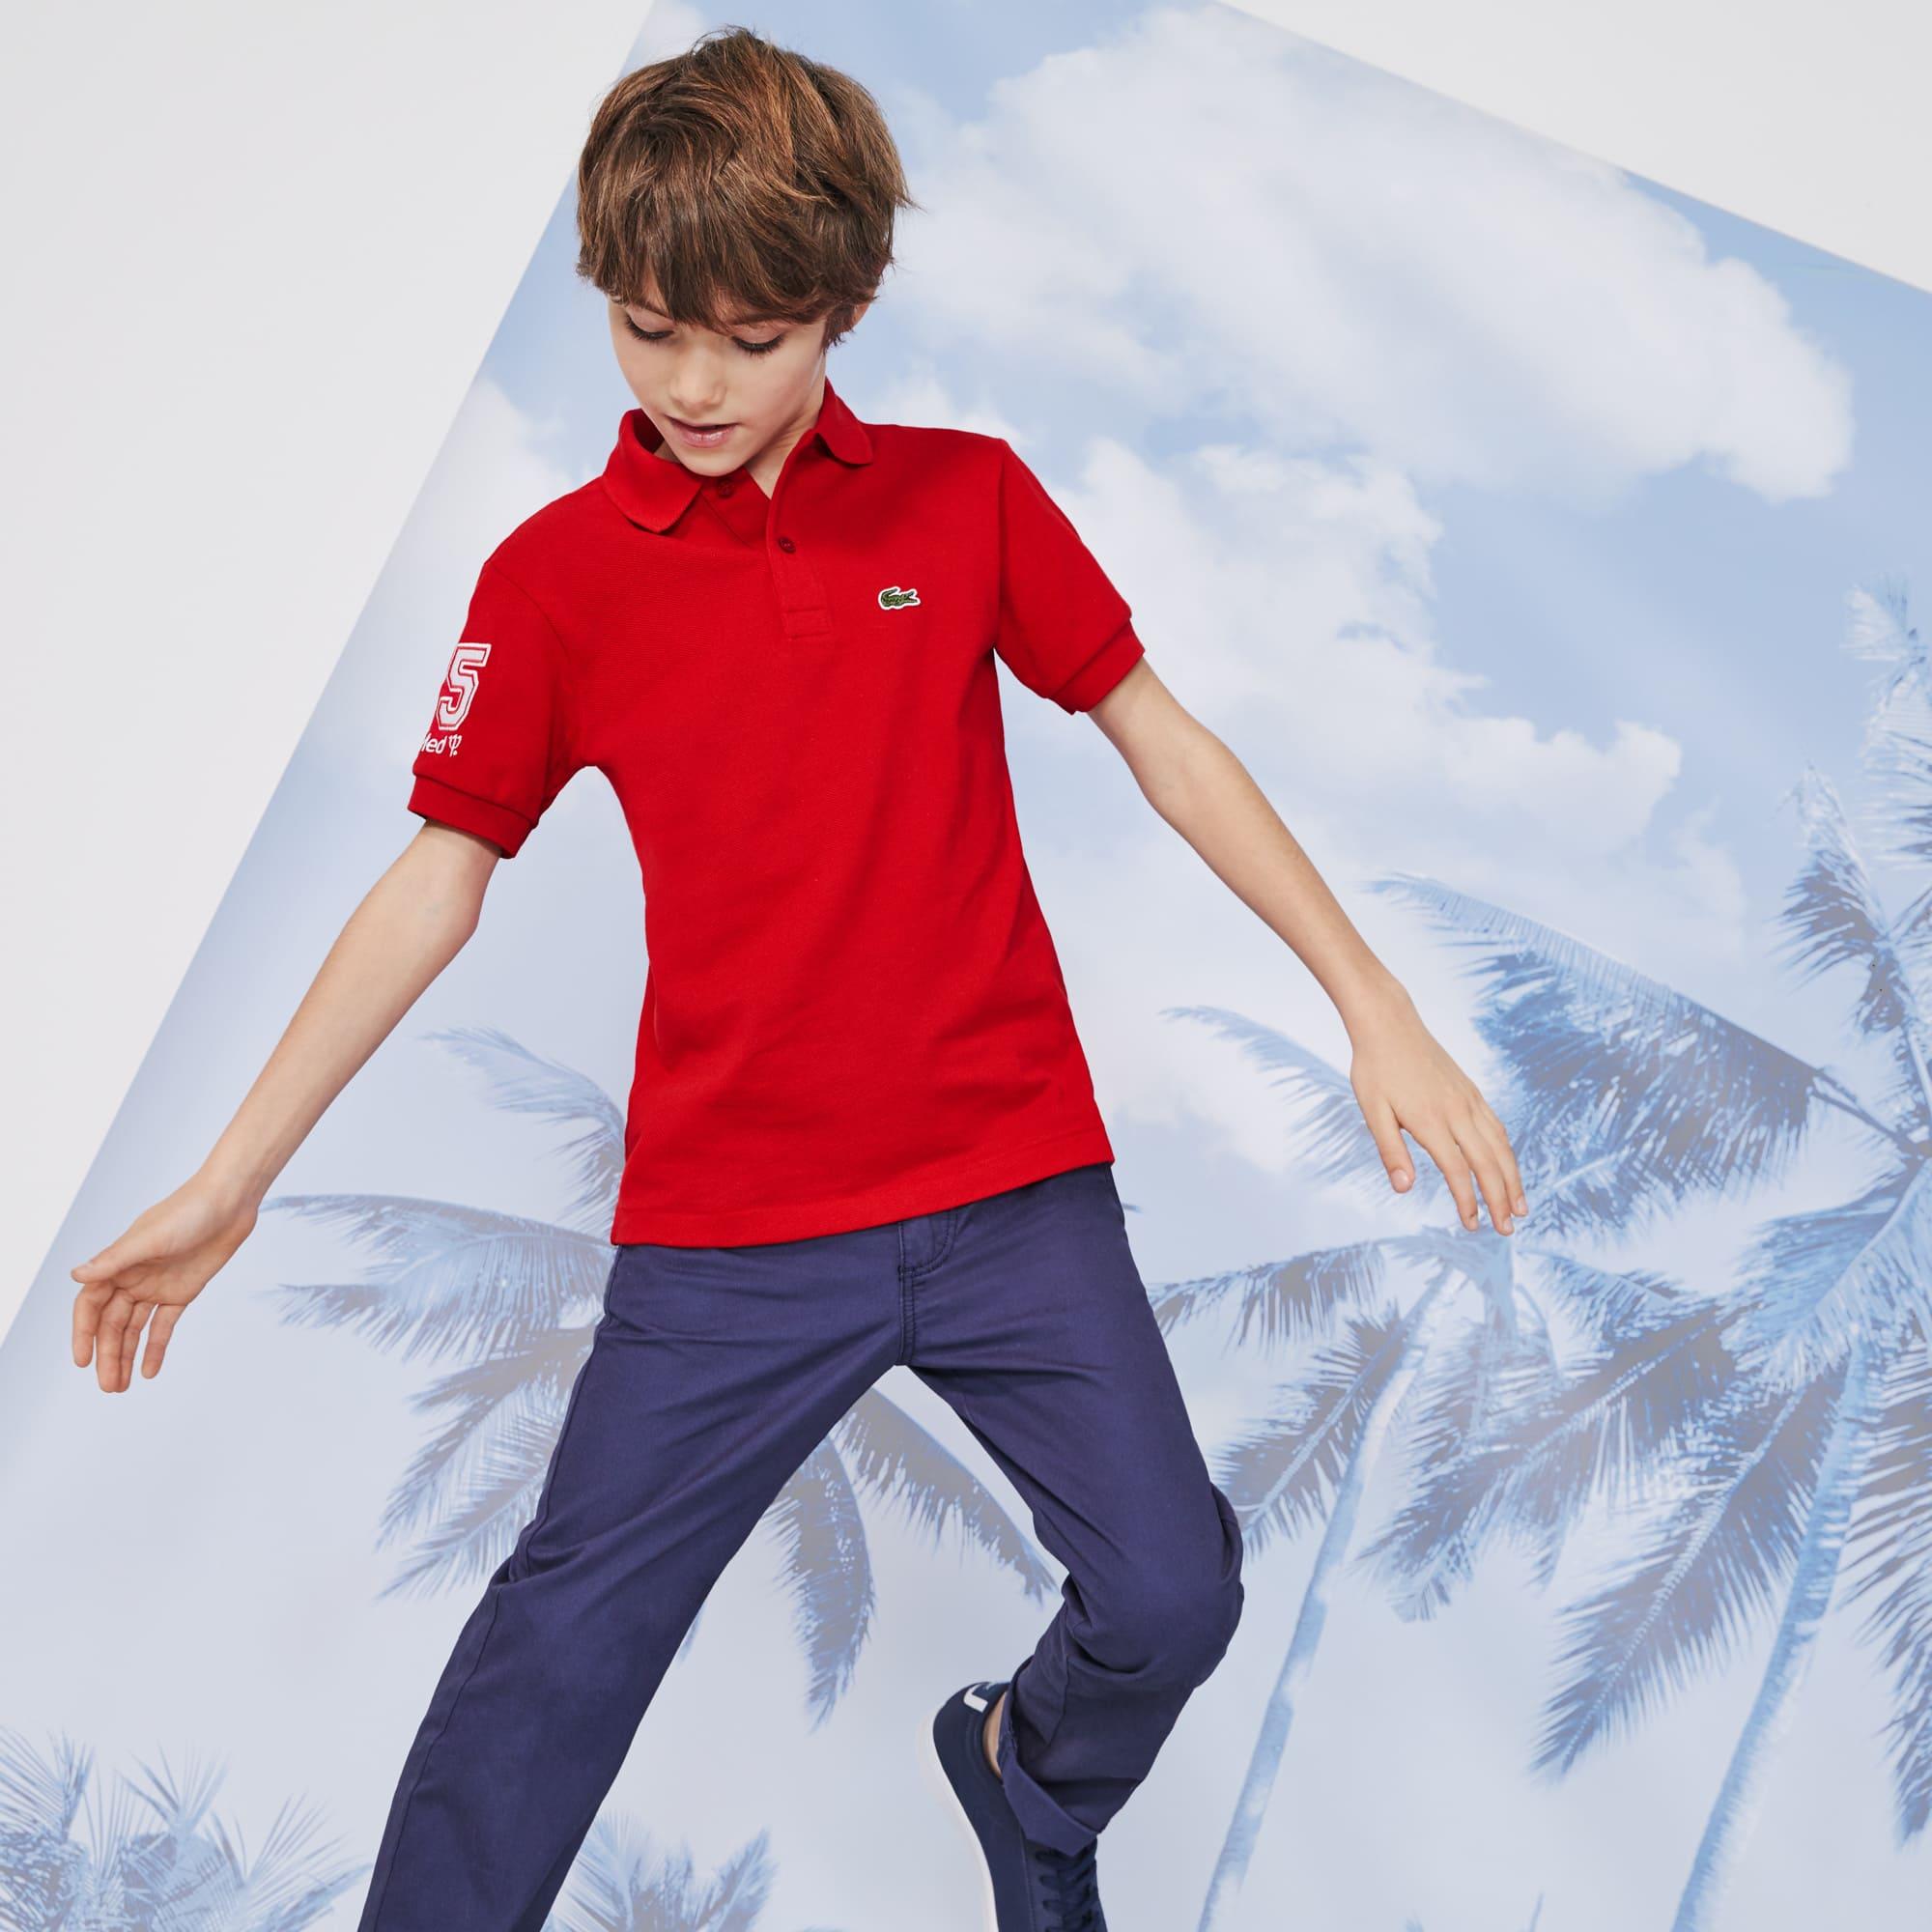 Lacoste Club Med Kid's Polo Shirt WIDH29YE